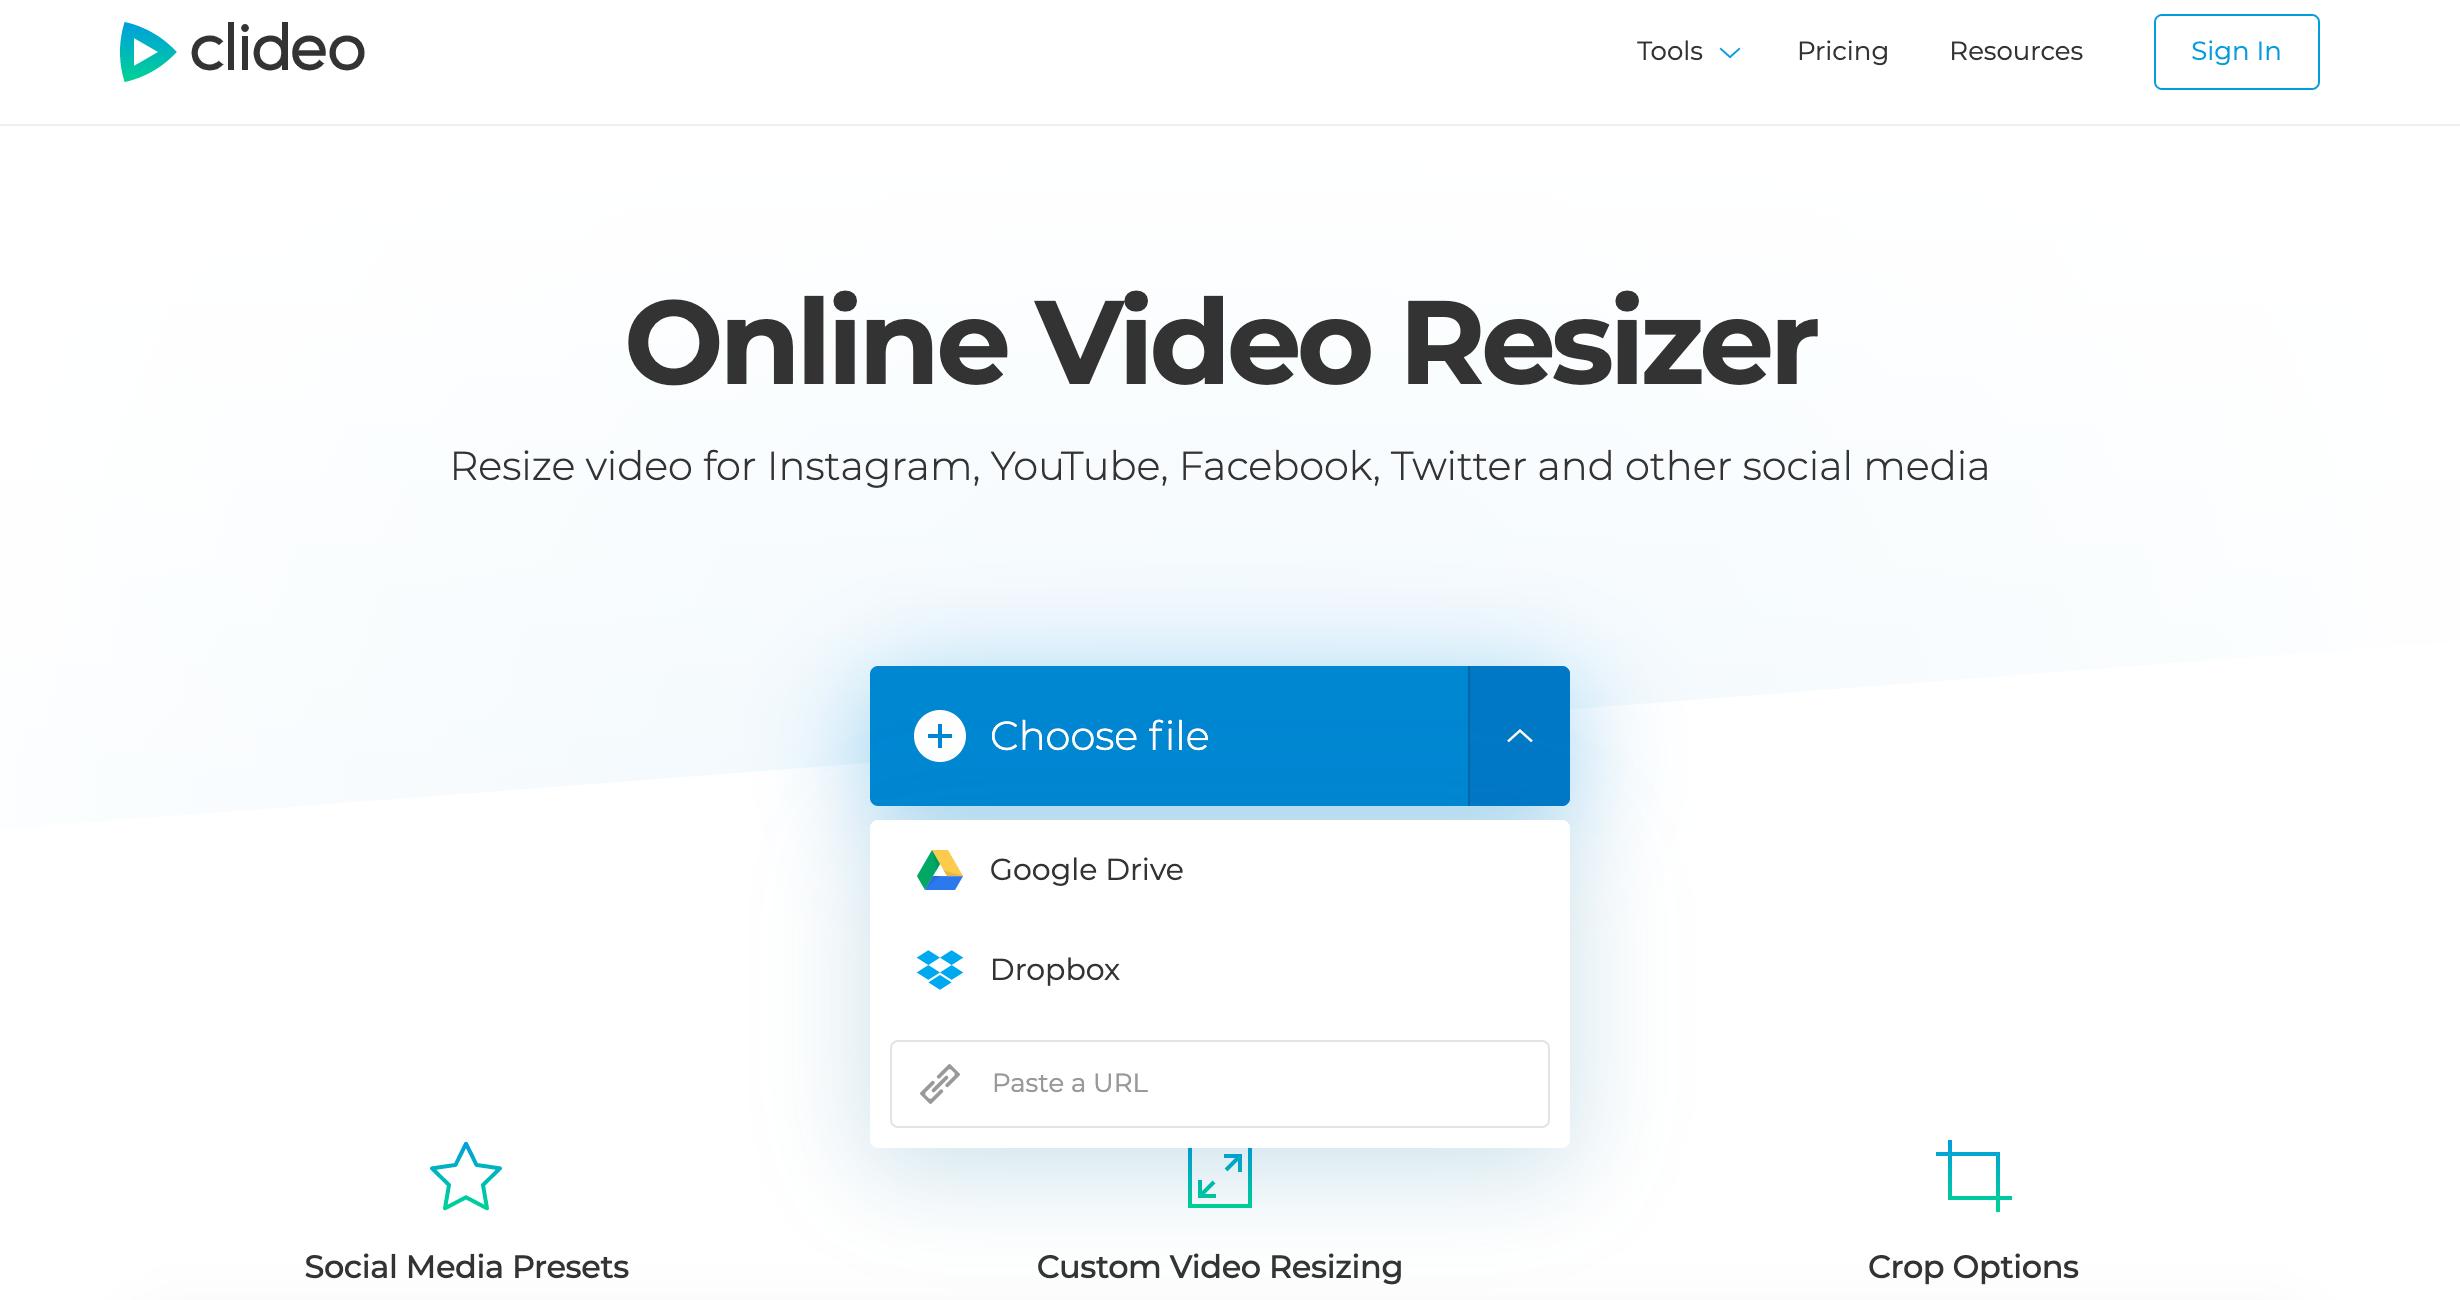 Upload video to remove black bars